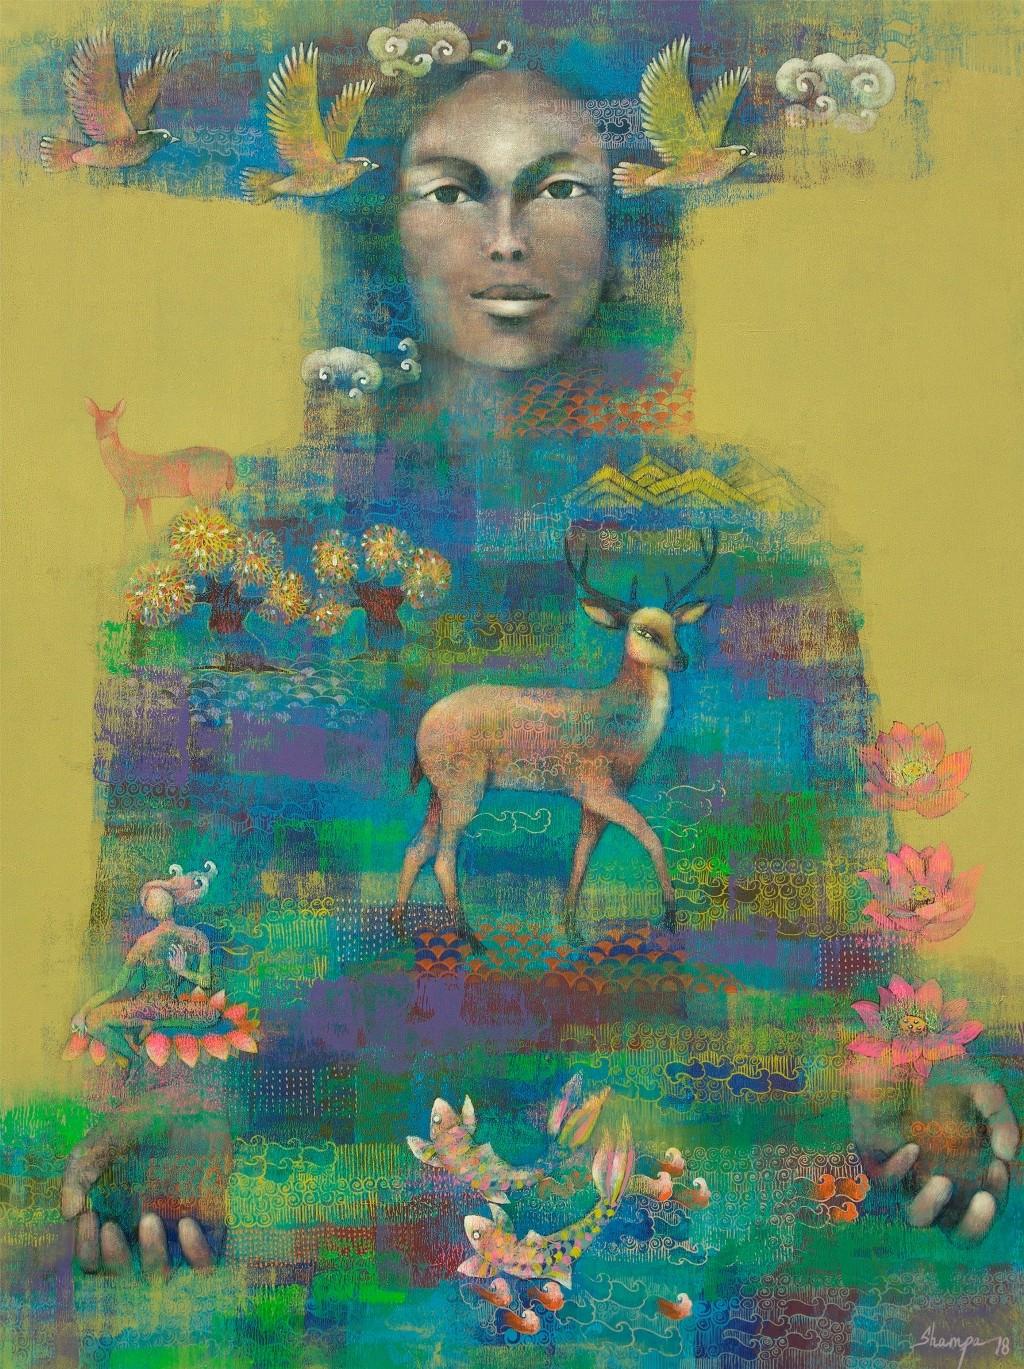 Prakriti - I by Shampa Sircar Das, Expressionism Painting, Acrylic on Canvas, Green color